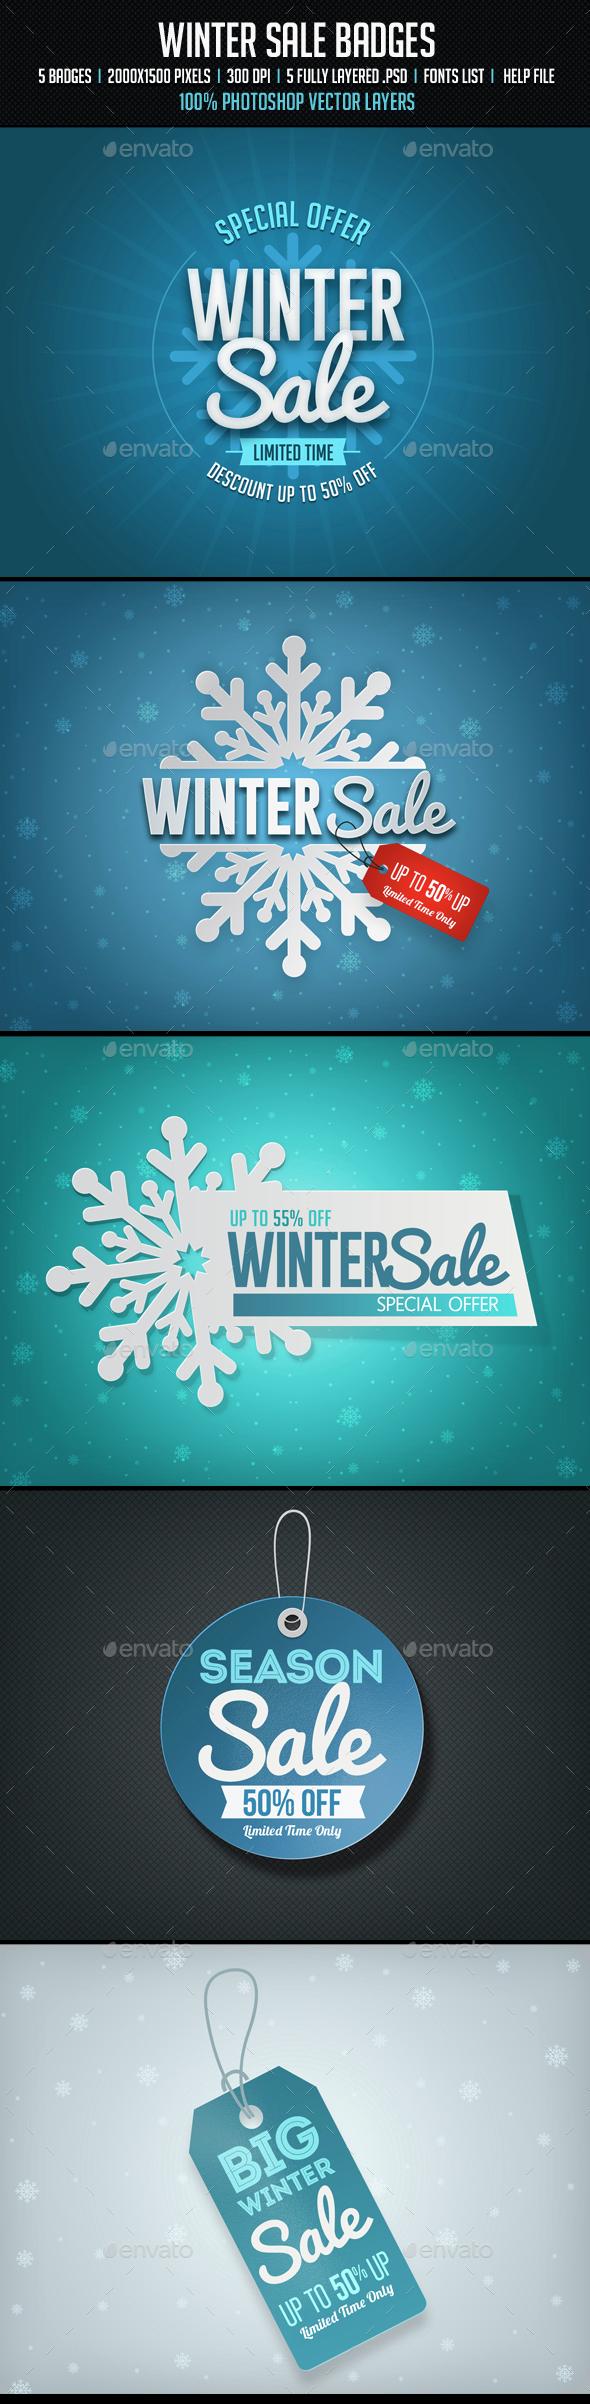 Winter Sale Badges - Badges & Stickers Web Elements